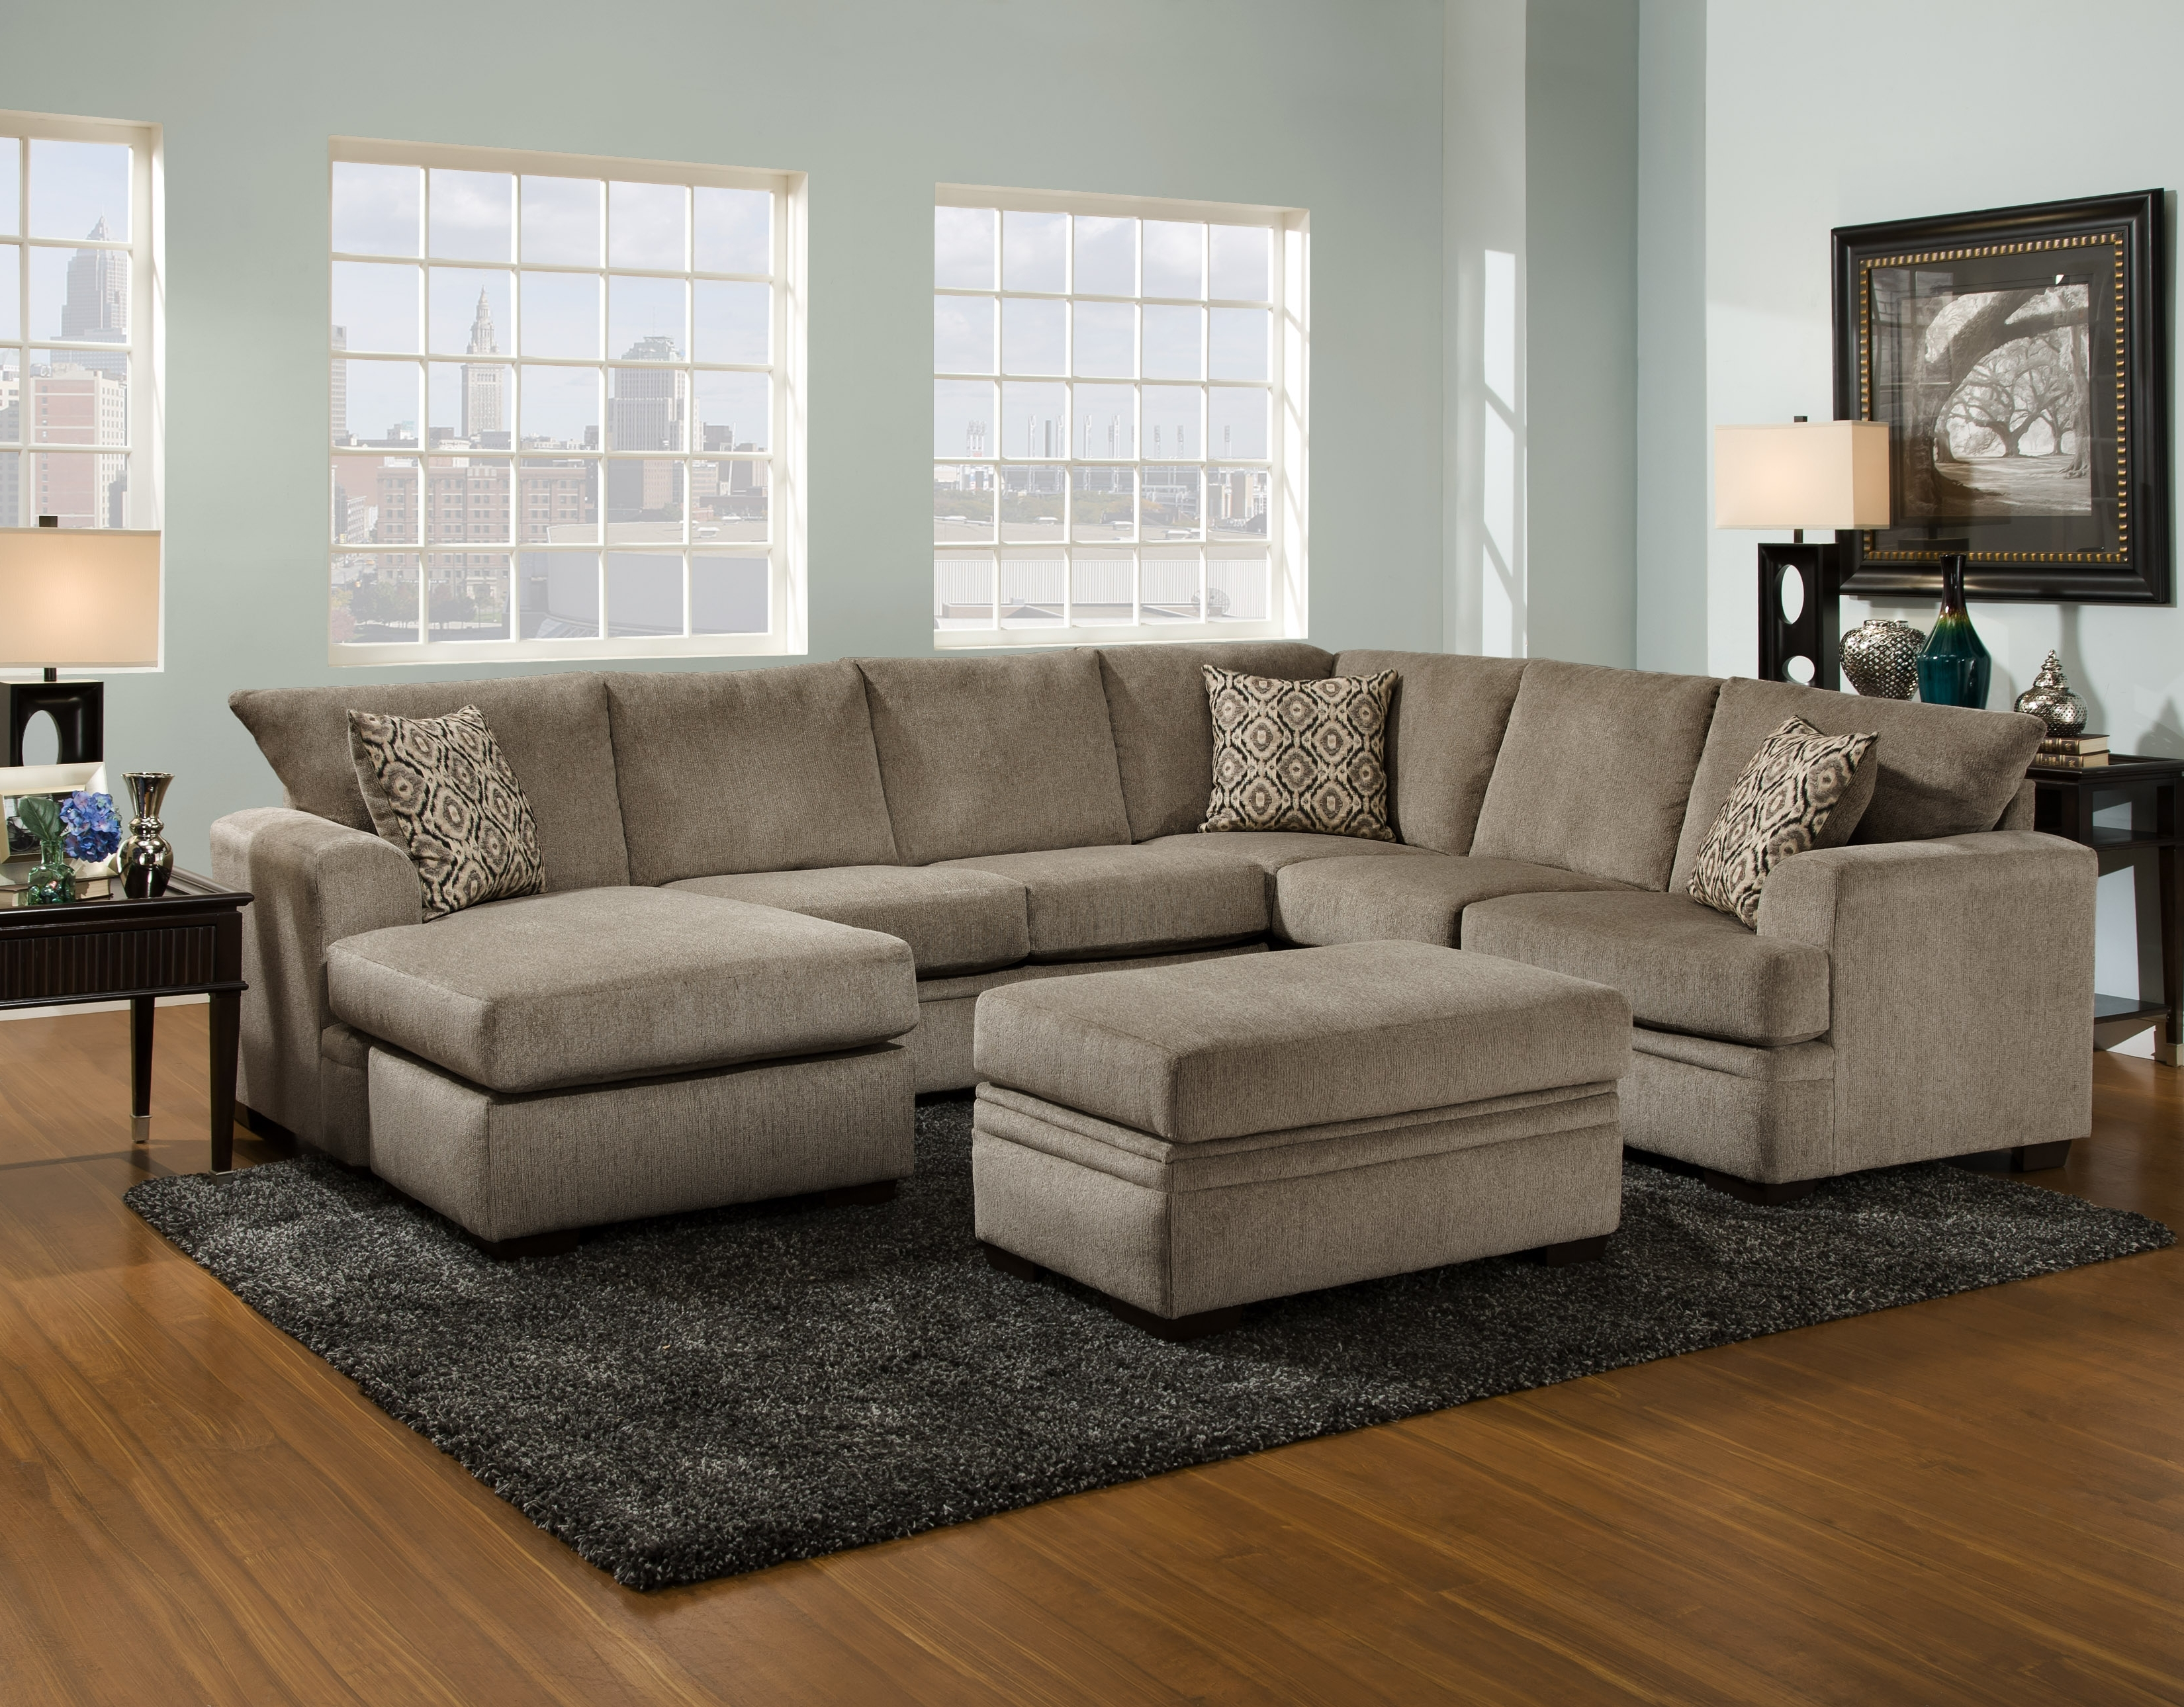 Janesville Wi Sectional Sofas regarding Trendy Living Room – Crazy Joe's Best Deal Furniture